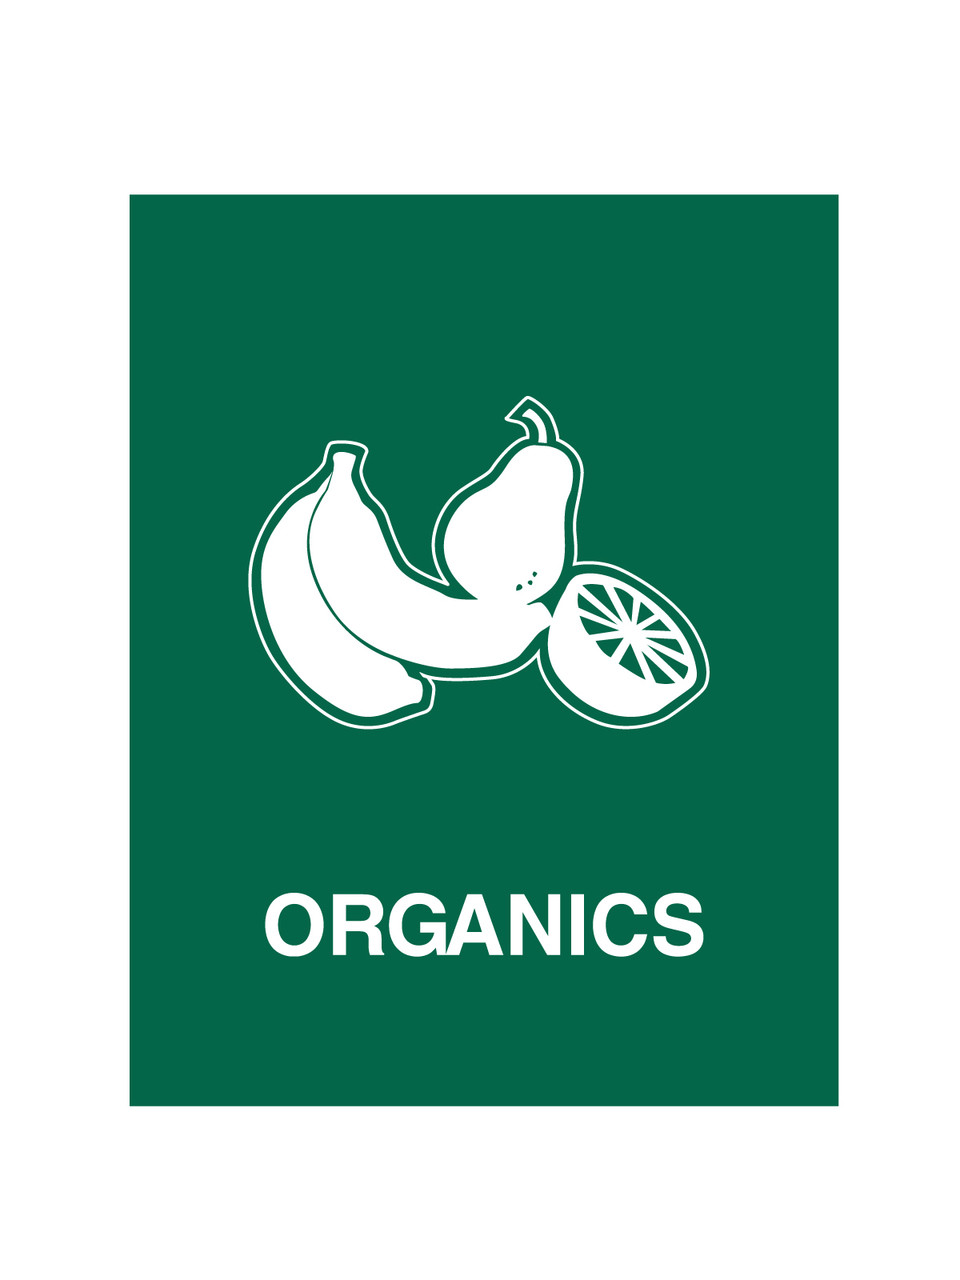 Organics Green